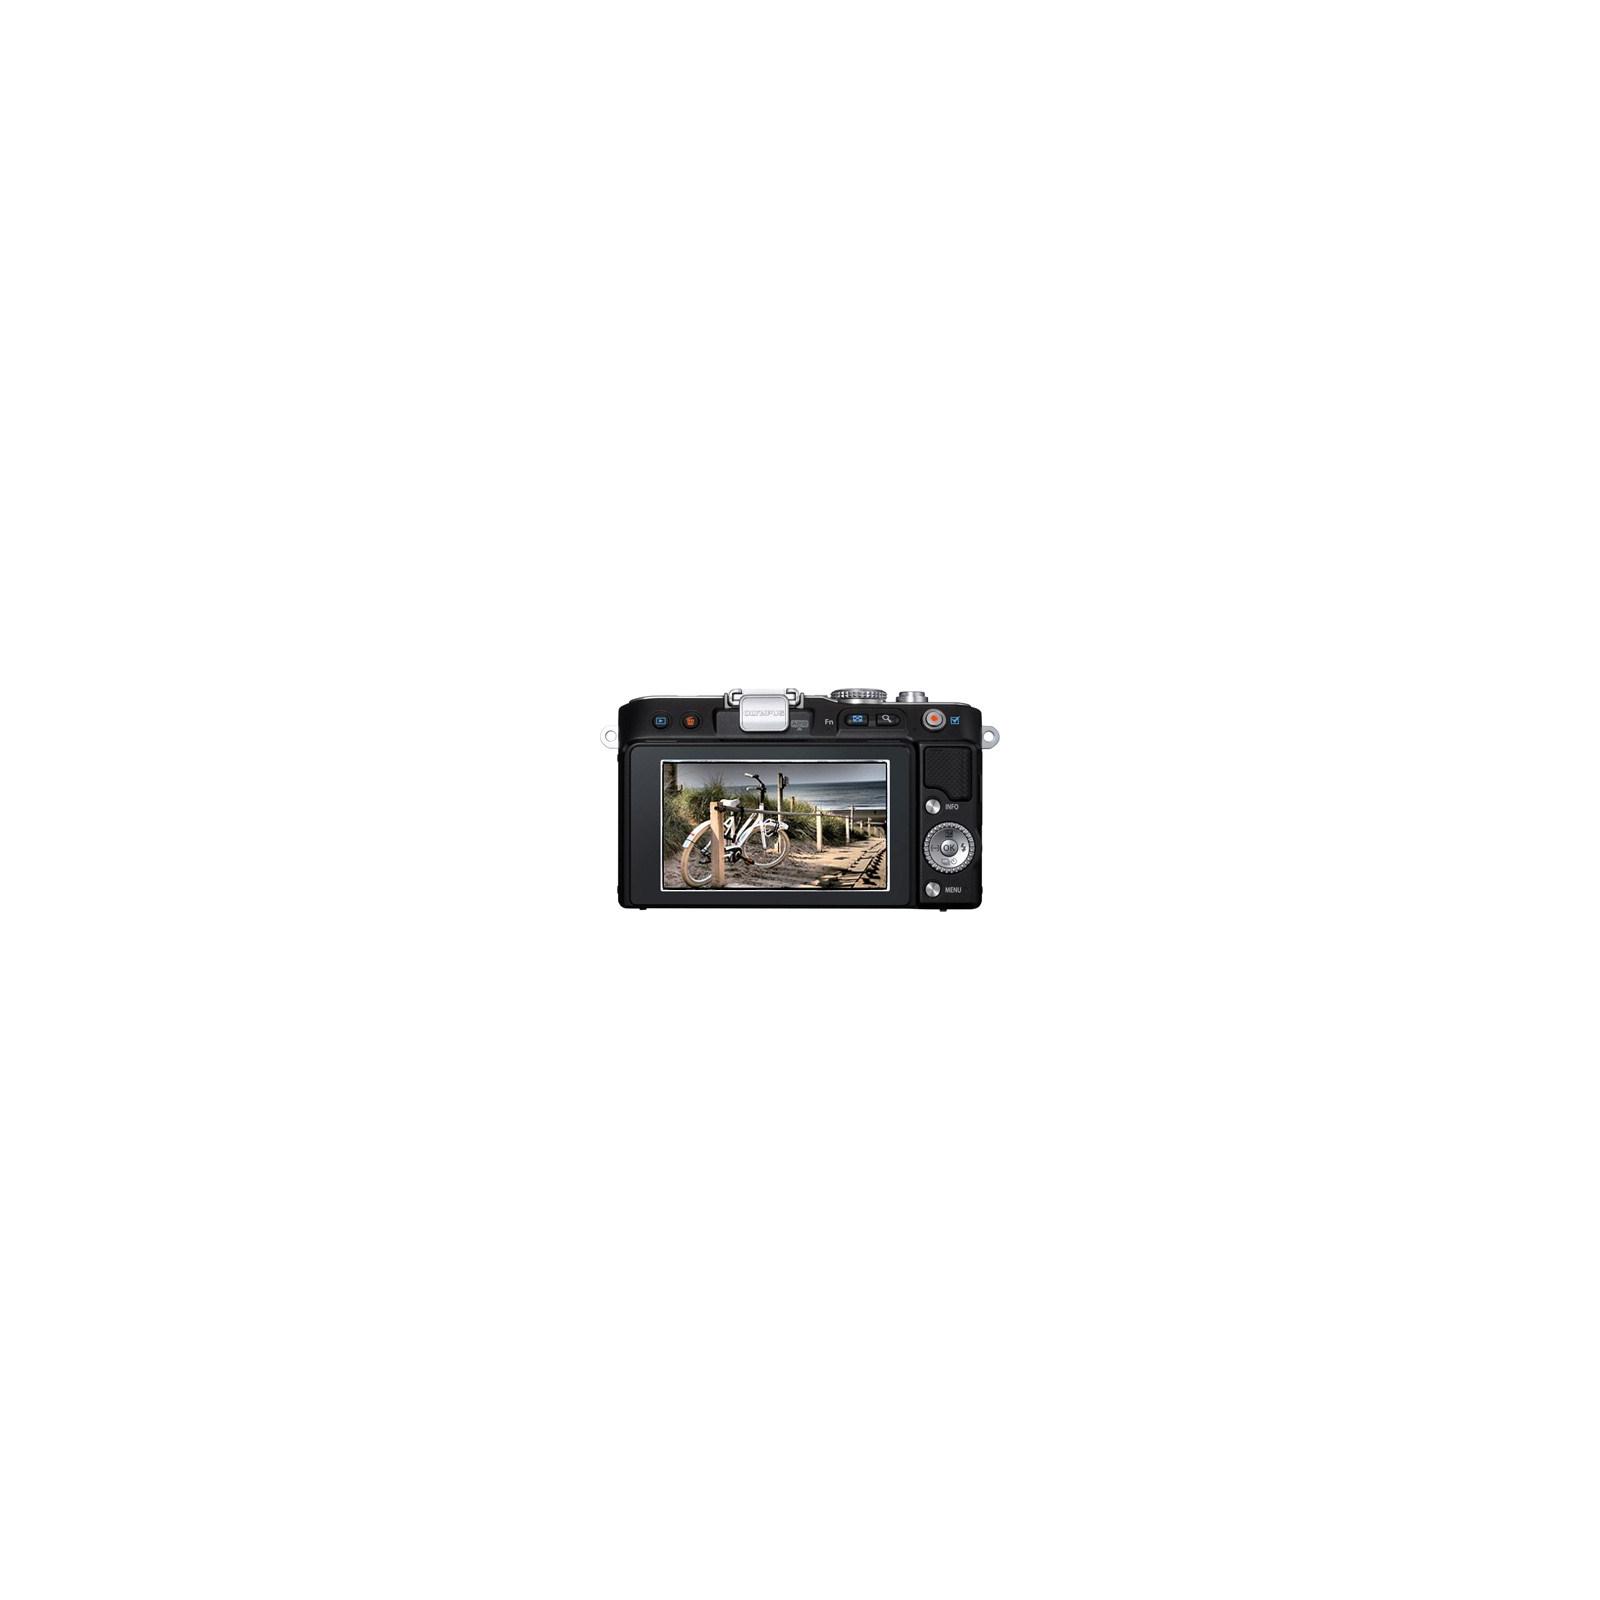 Цифровой фотоаппарат OLYMPUS PEN E-PL3 14-42 mm kit black/black (V20503BBE000/V205031BE000) изображение 2